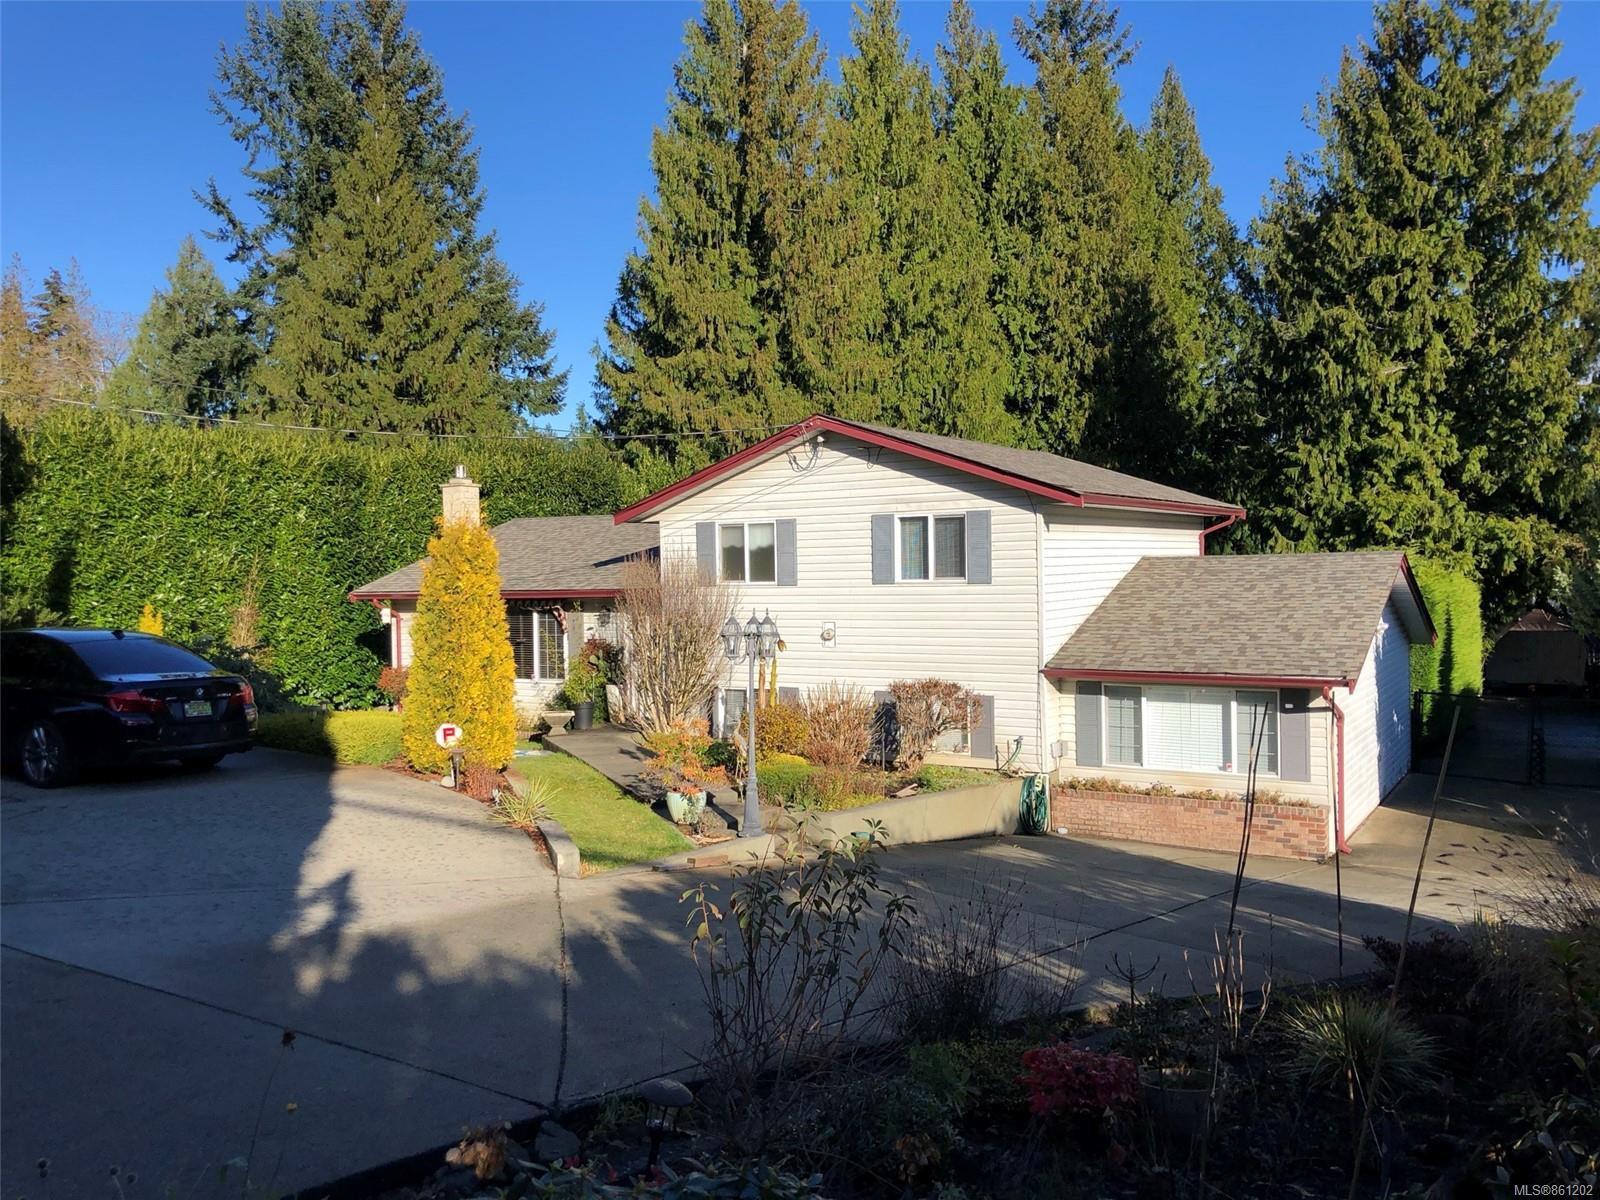 Main Photo: 3842 Jingle Pot Rd in : Na North Jingle Pot House for sale (Nanaimo)  : MLS®# 861202